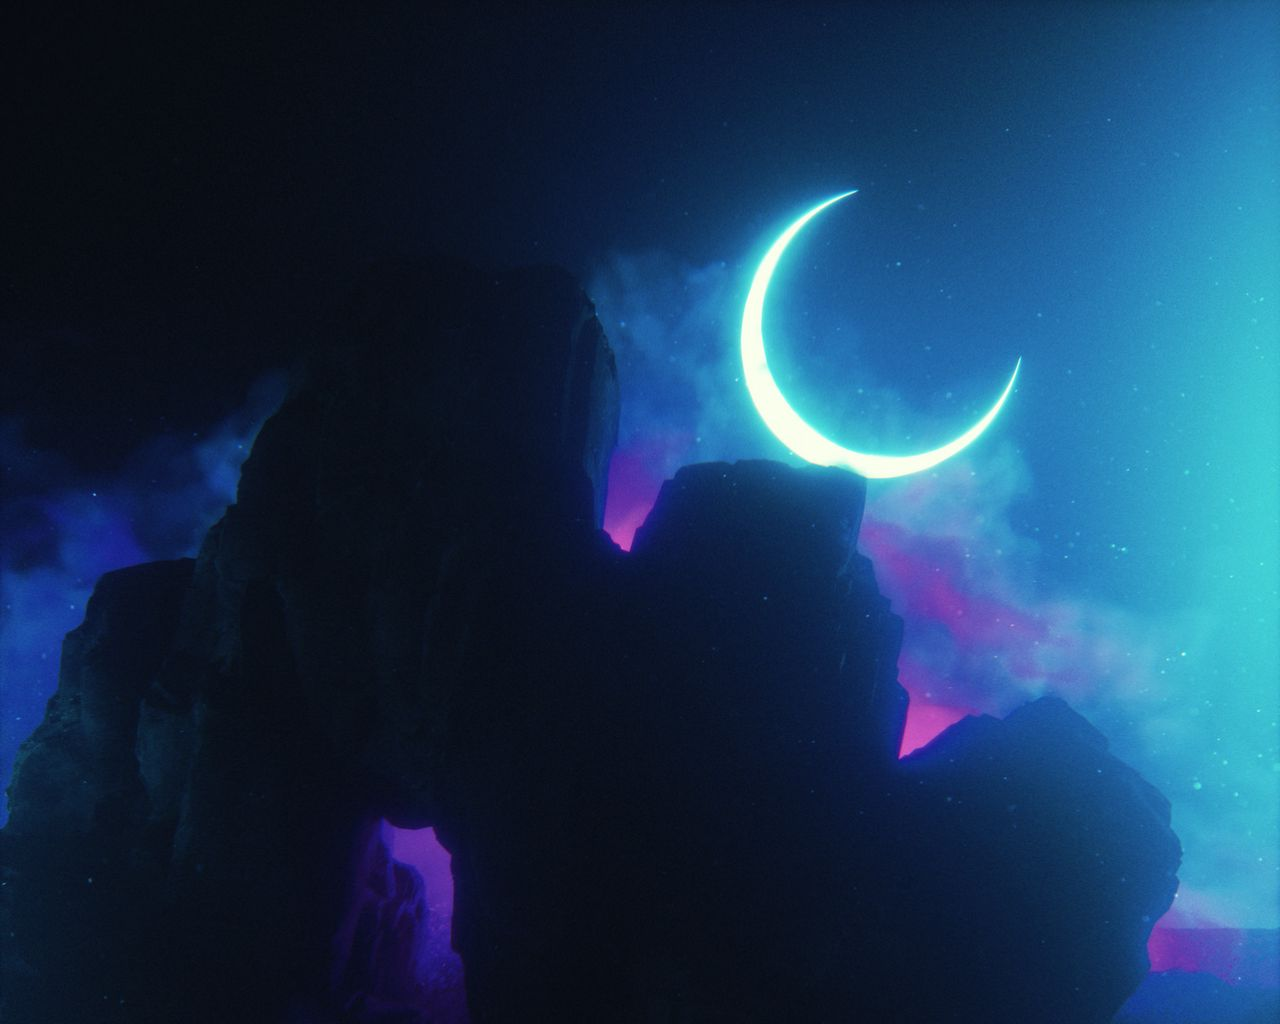 1280x1024 Wallpaper rock, neon, smoke, moon, light, bright